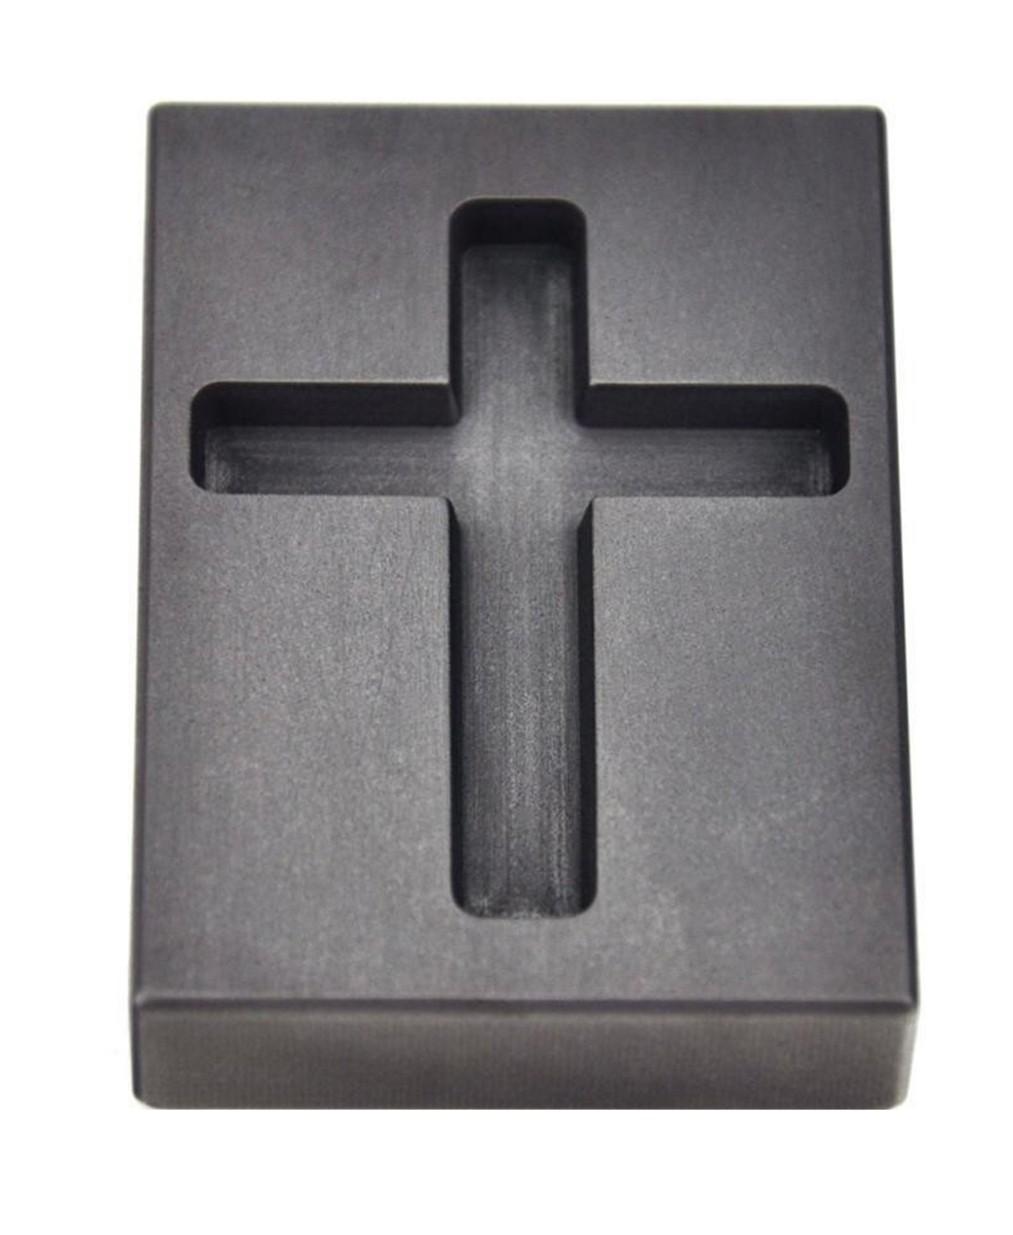 1 Troy Ounce Gold Cross Graphite Ingot Mold